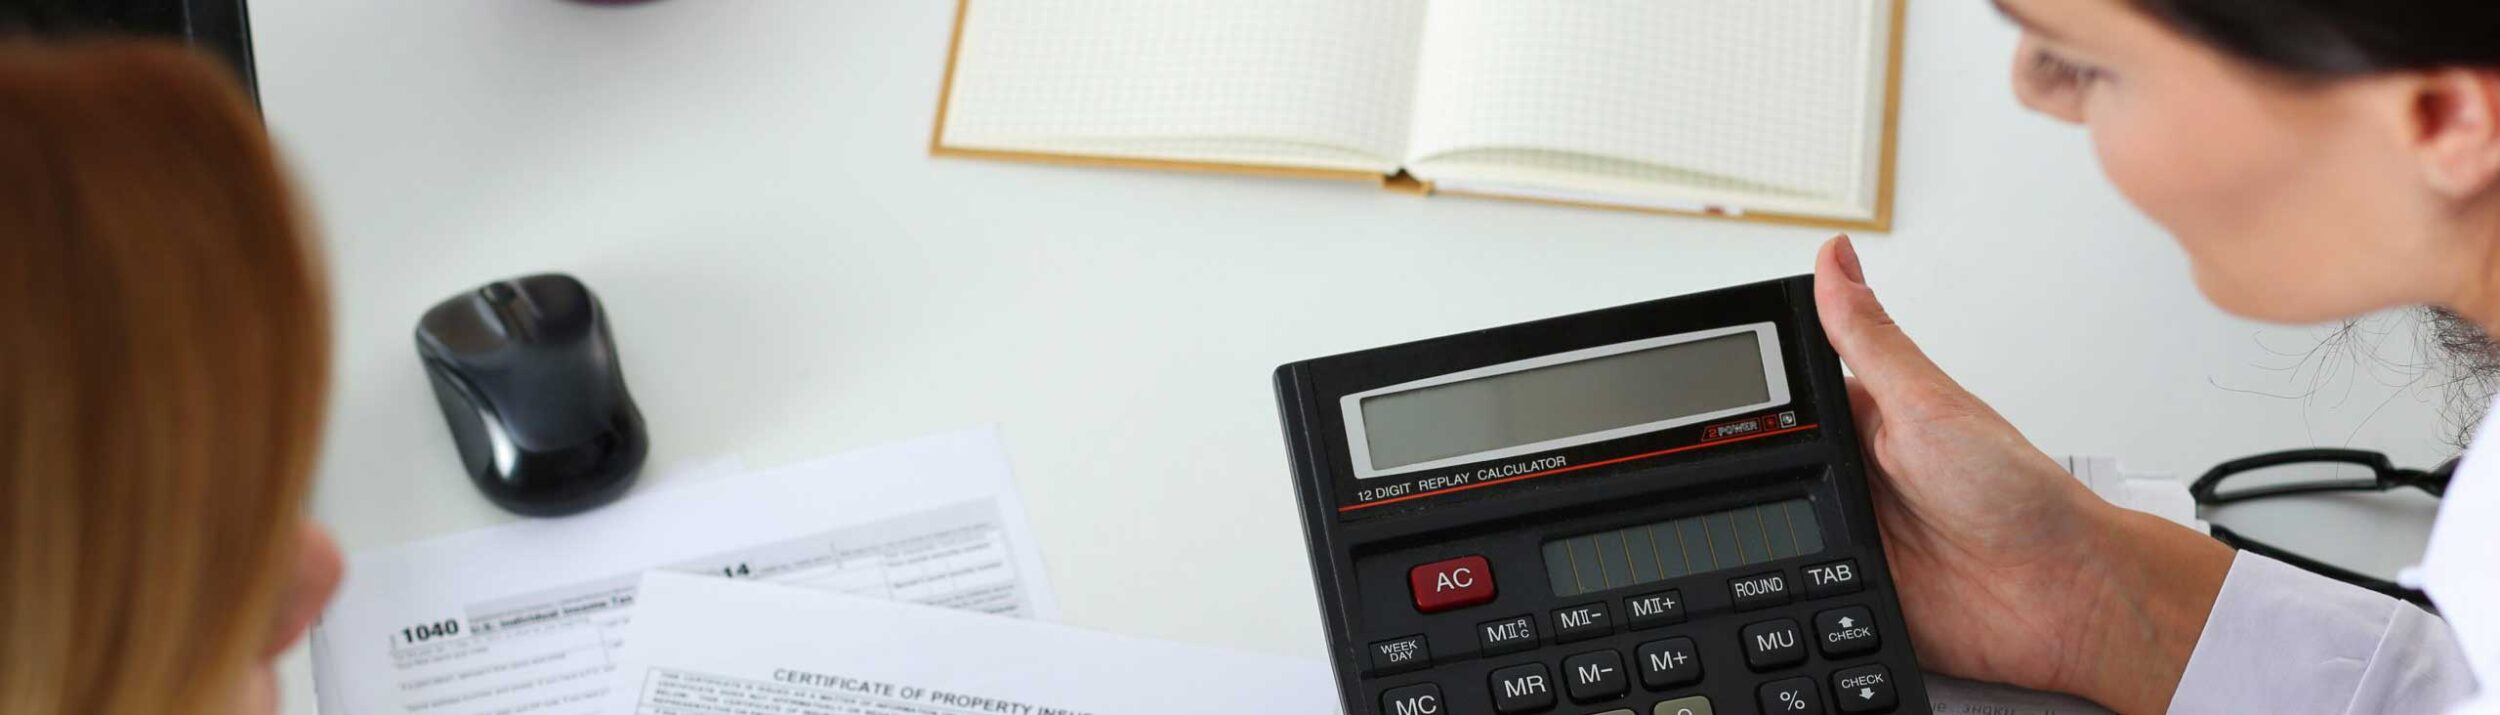 salaris-accountant